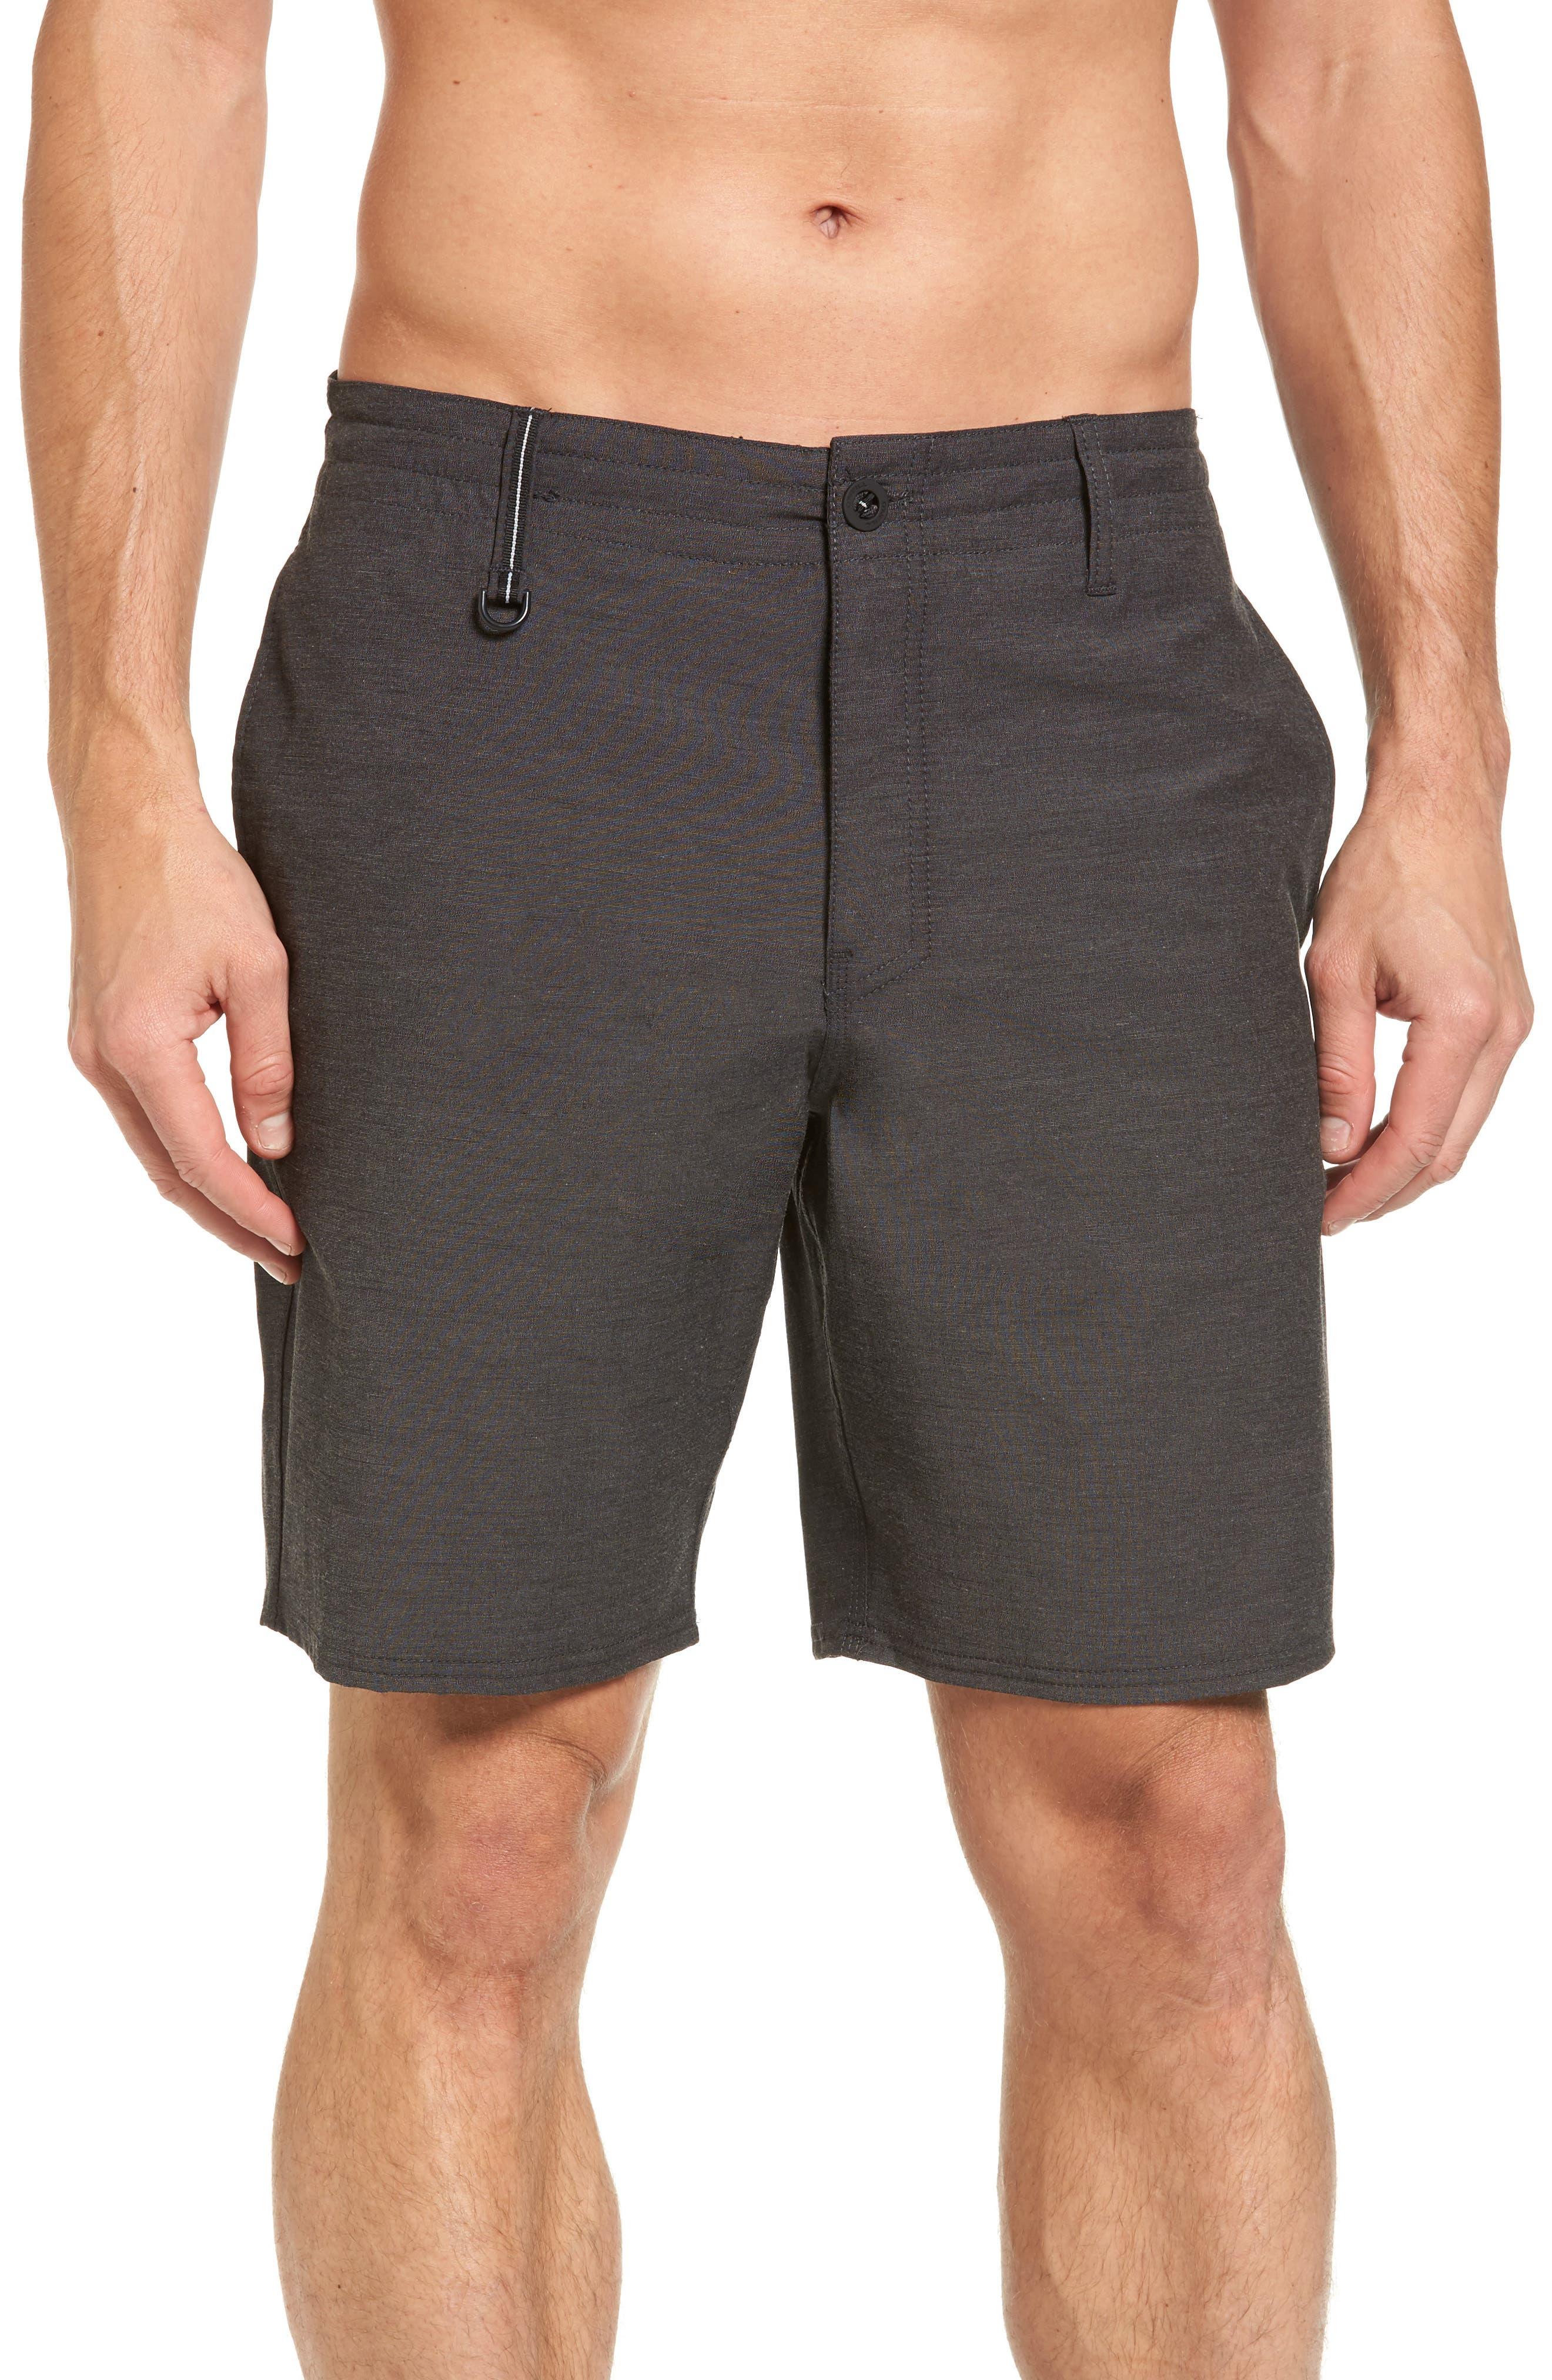 Traveler Recon Hybrid Shorts,                             Alternate thumbnail 4, color,                             Black